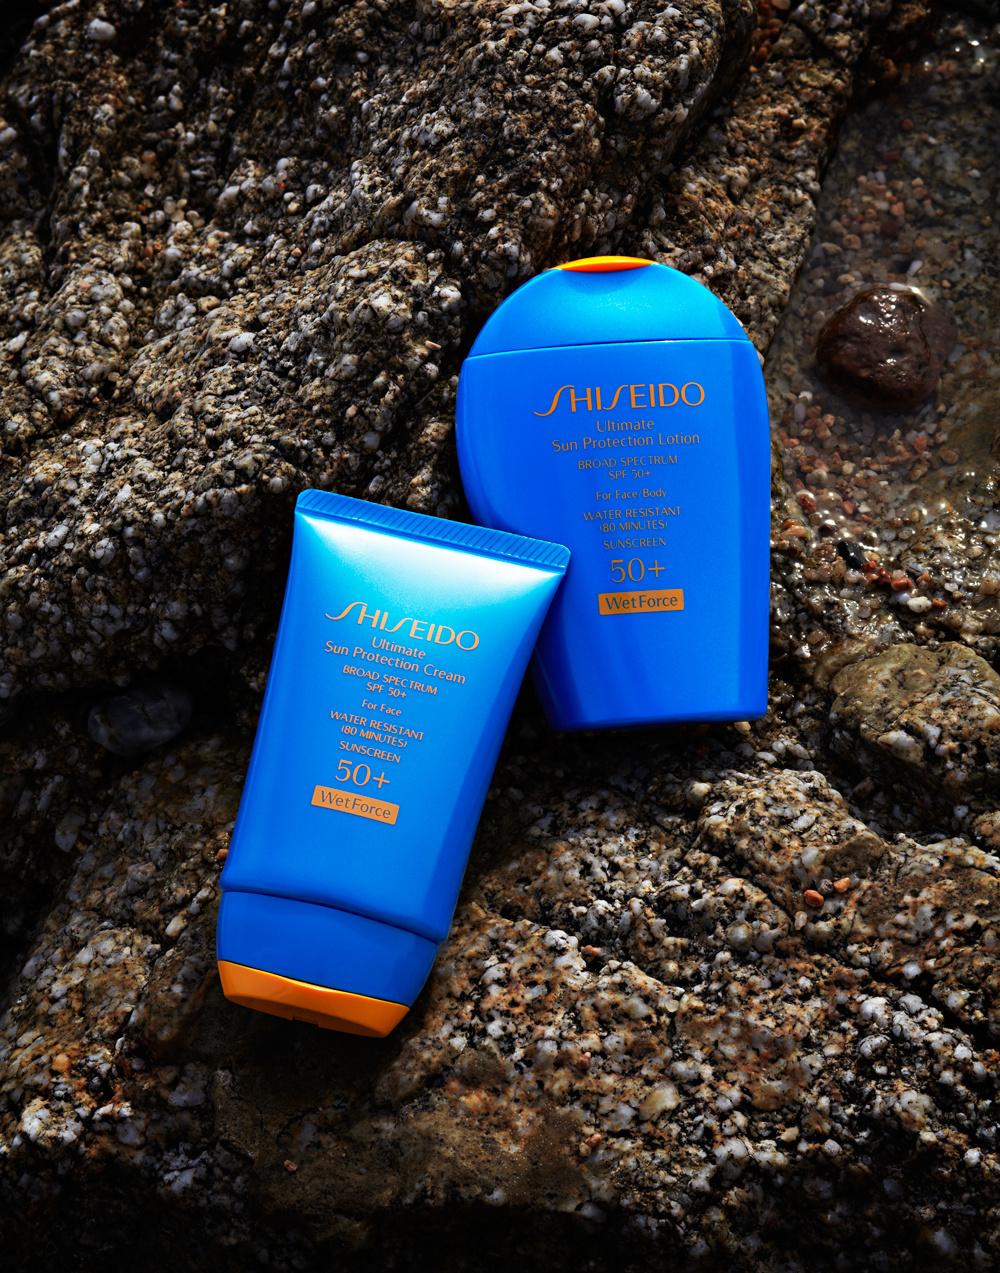 shiseido-ultimate-sun-deponline